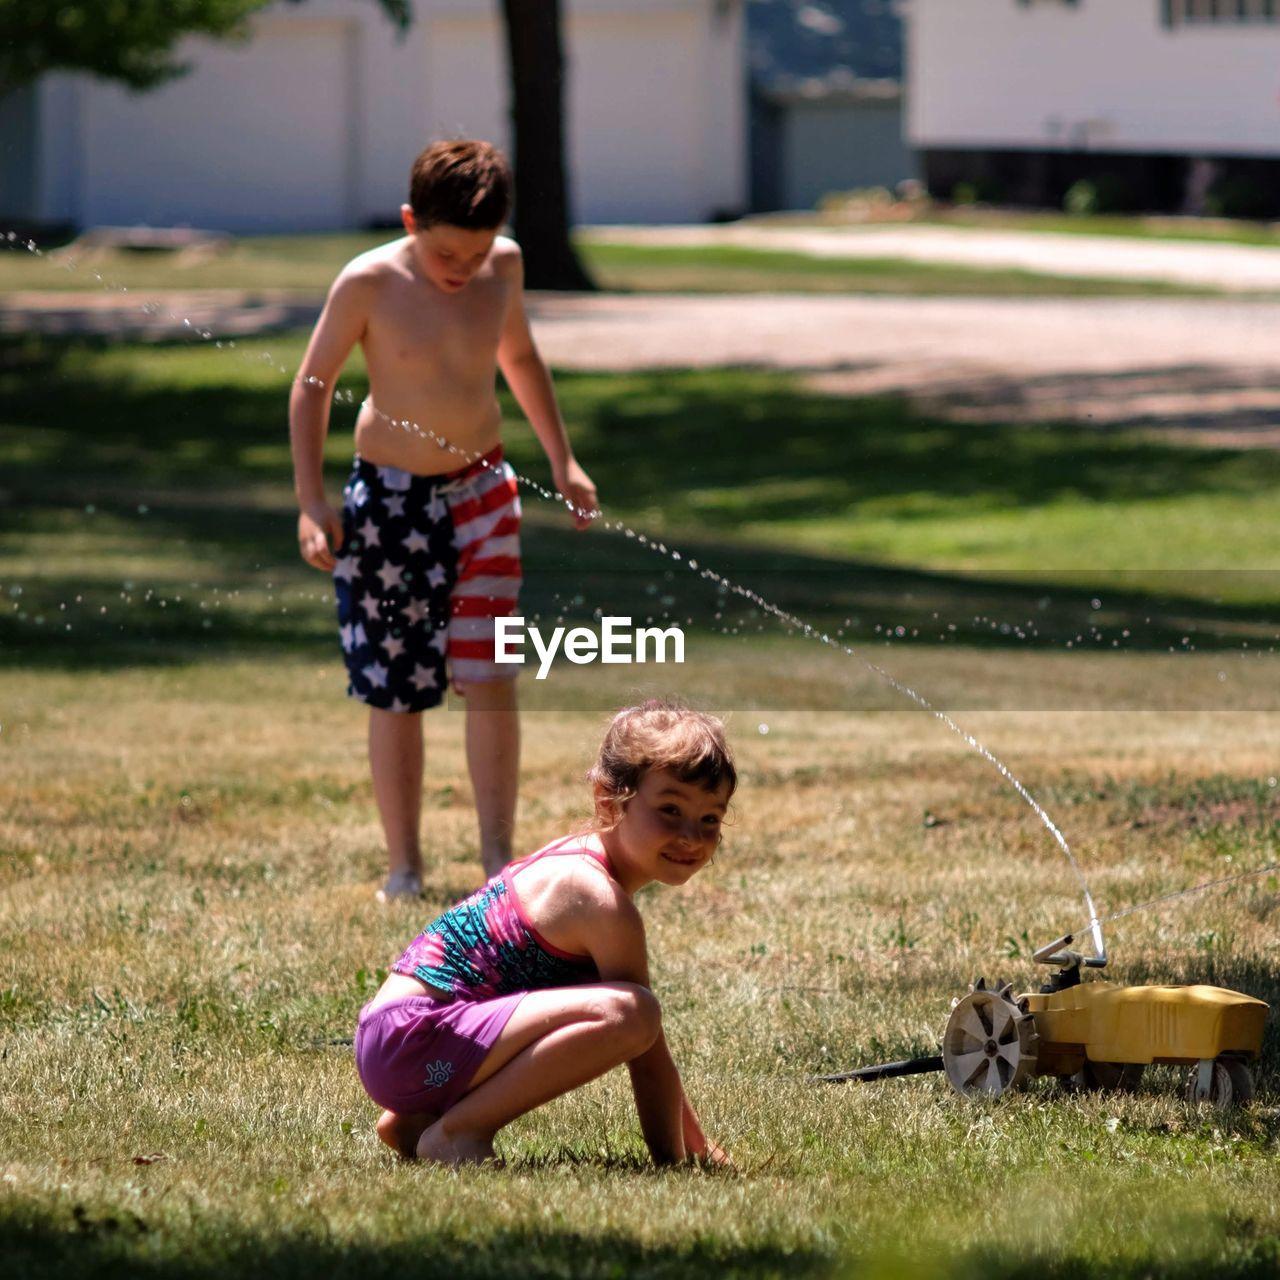 Water spraying on shirtless boy with sister in yard